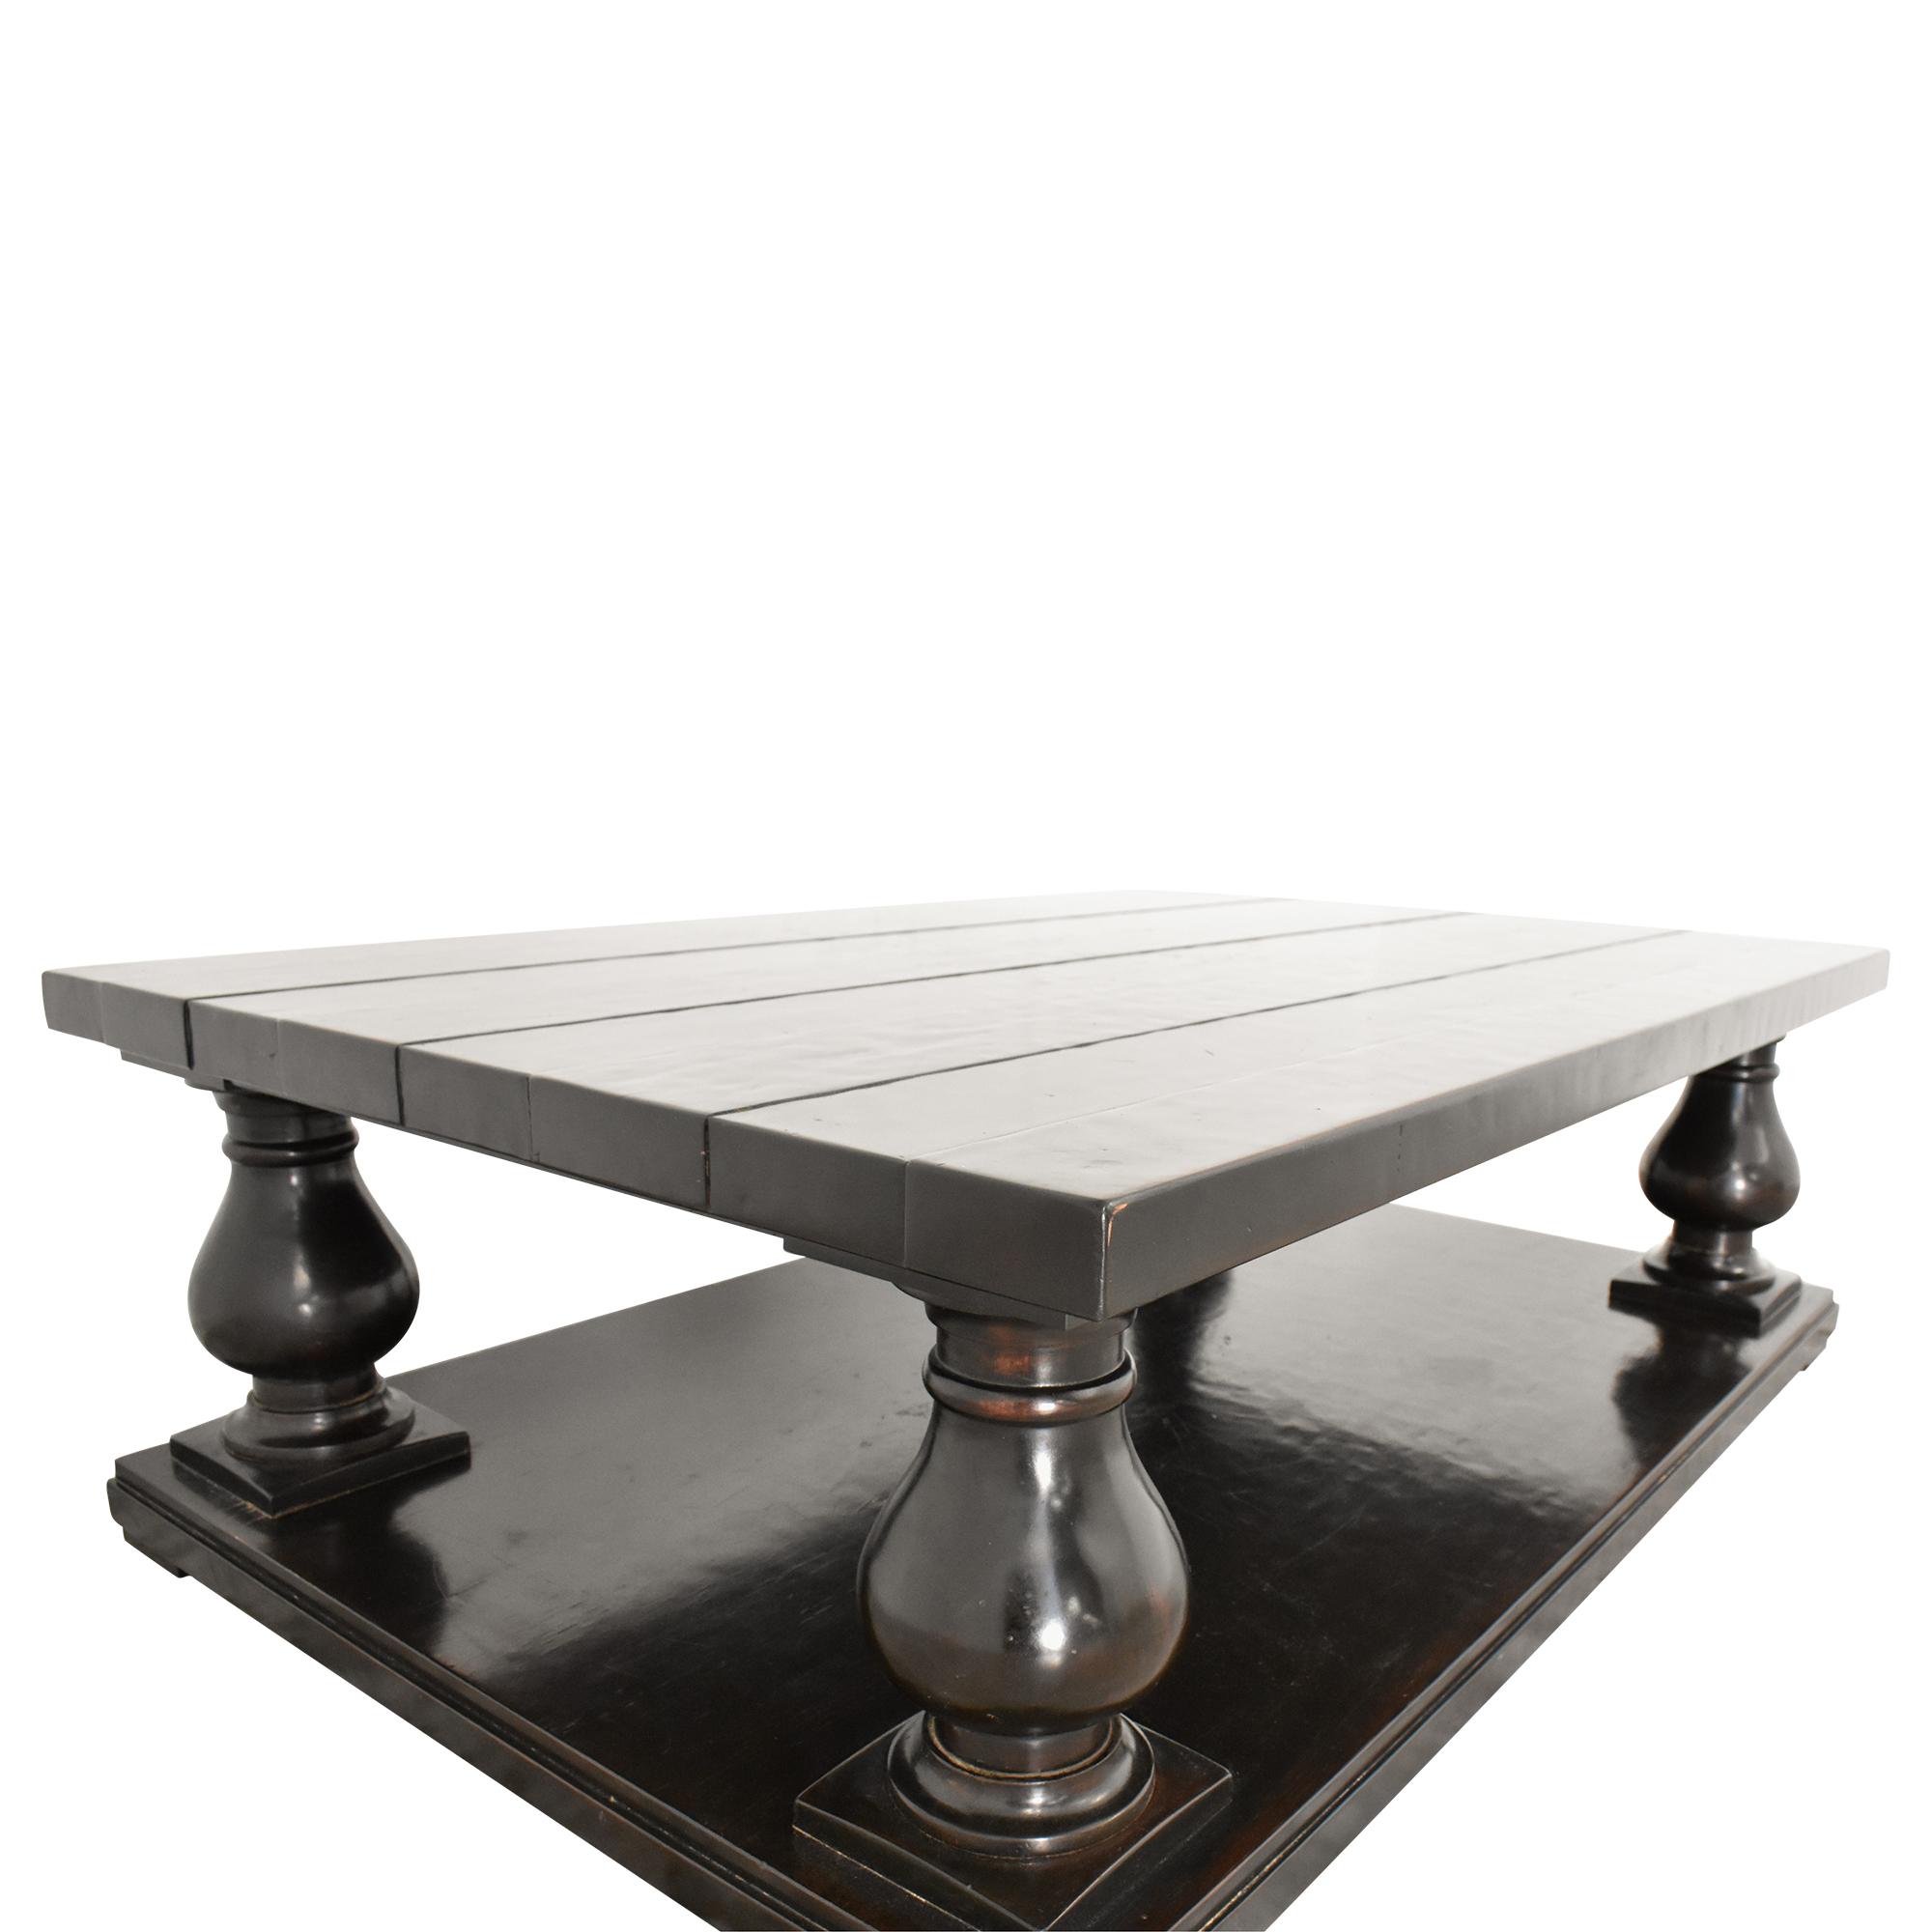 Bernhardt Bernhardt Freeport Cocktail Table on sale